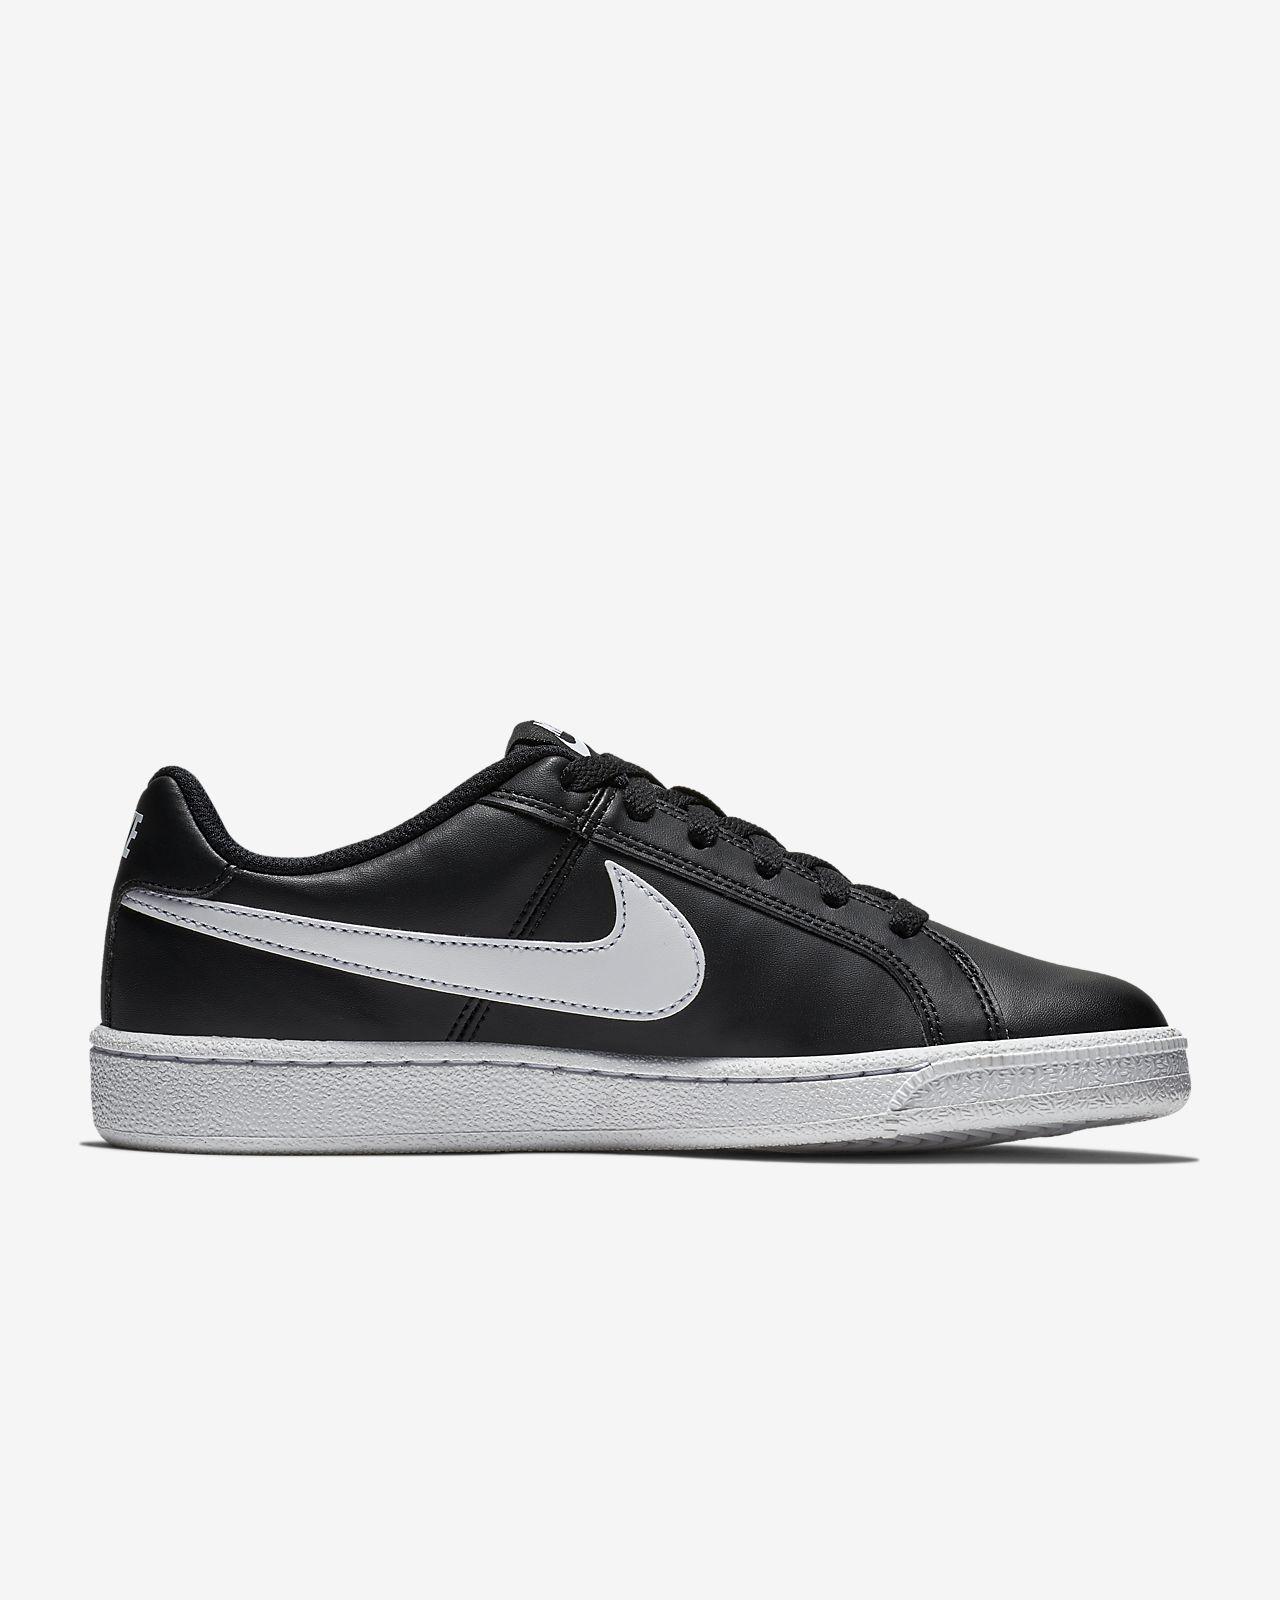 on sale cd4ea a2e5b ... NikeCourt Royale SL Women s Shoe